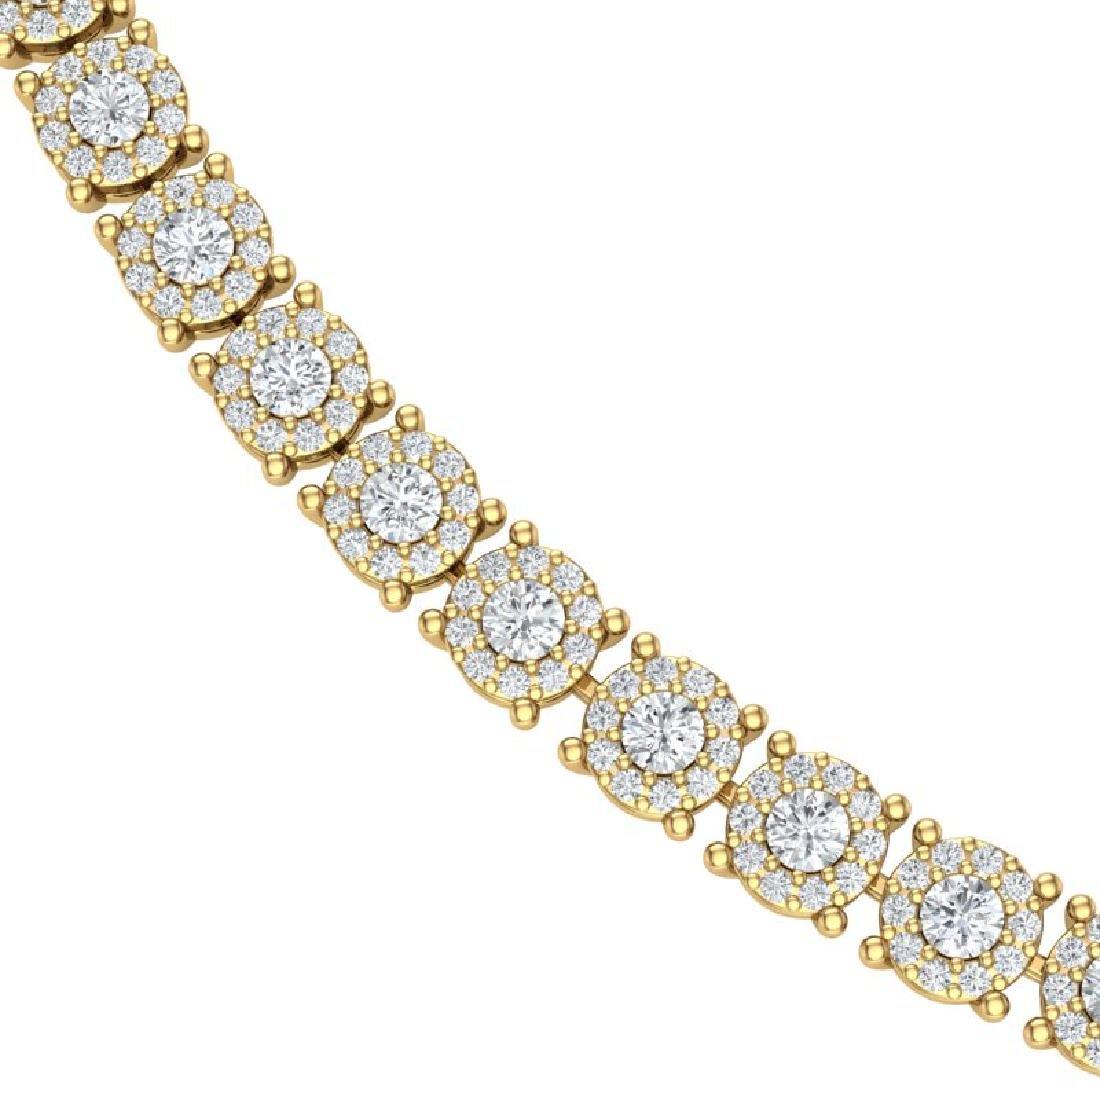 12 CTW Certified SI/I Diamond Halo Necklace 18K Yellow - 2